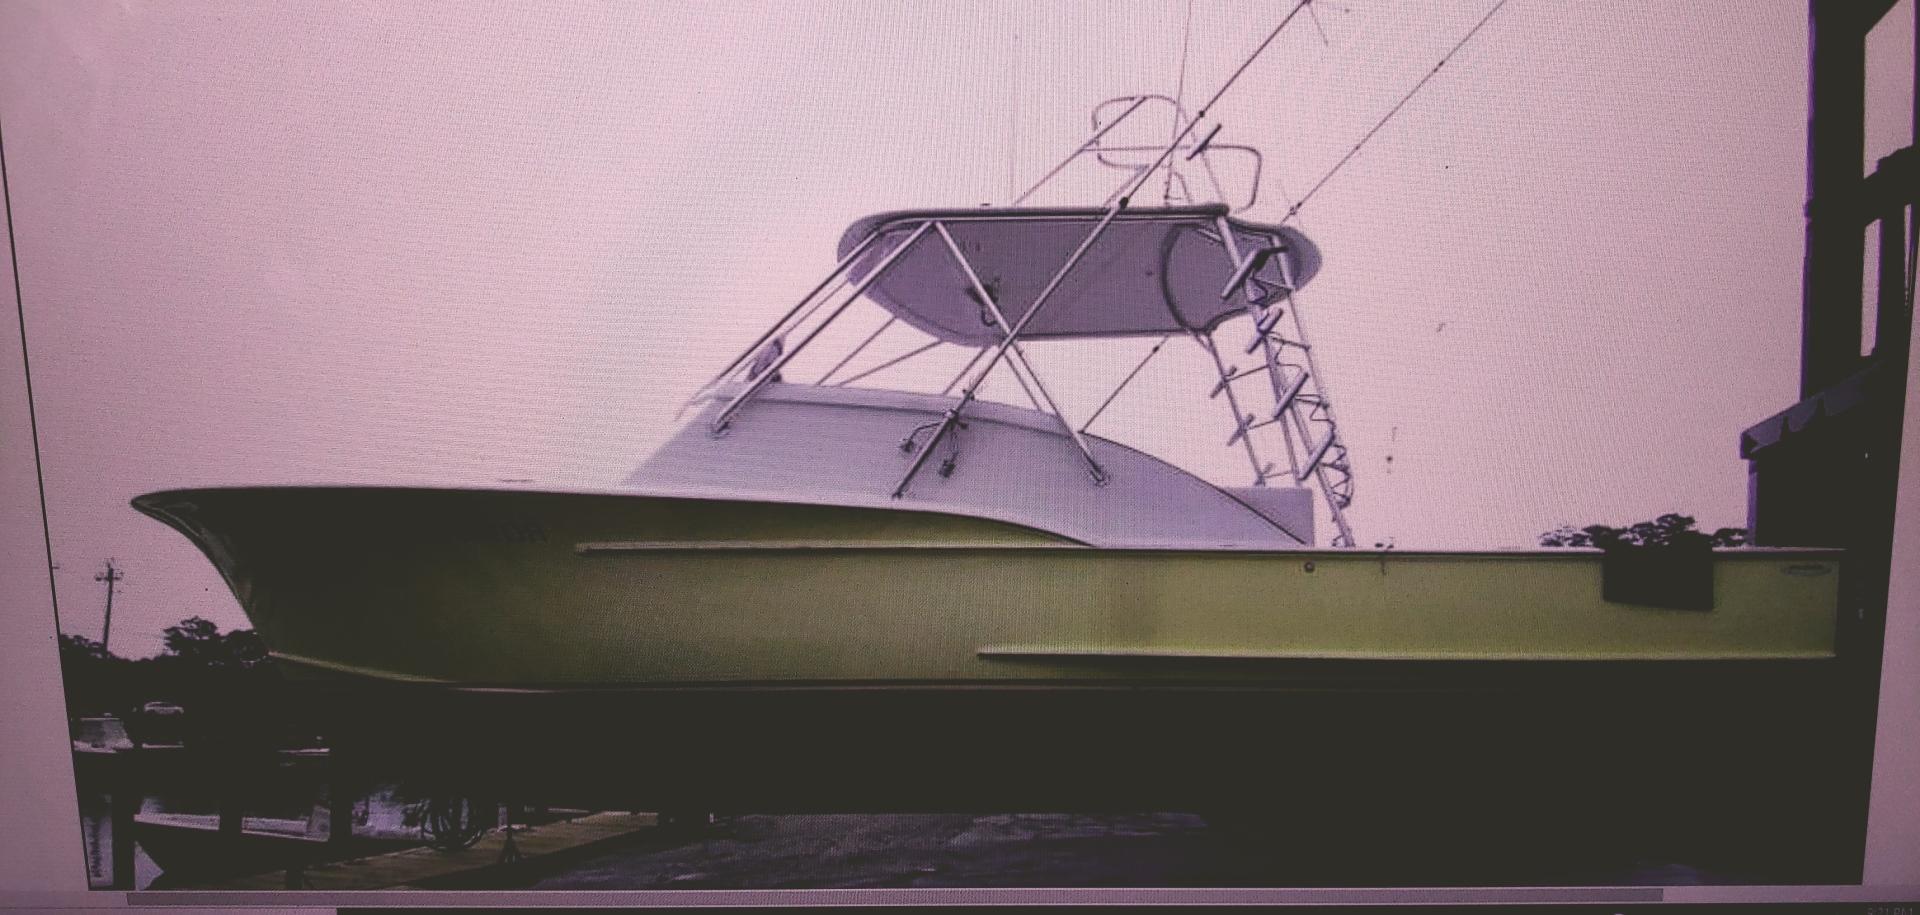 Shearline-Custom Express 2004-Senator Beaufort-North Carolina-United States-1512802 | Thumbnail